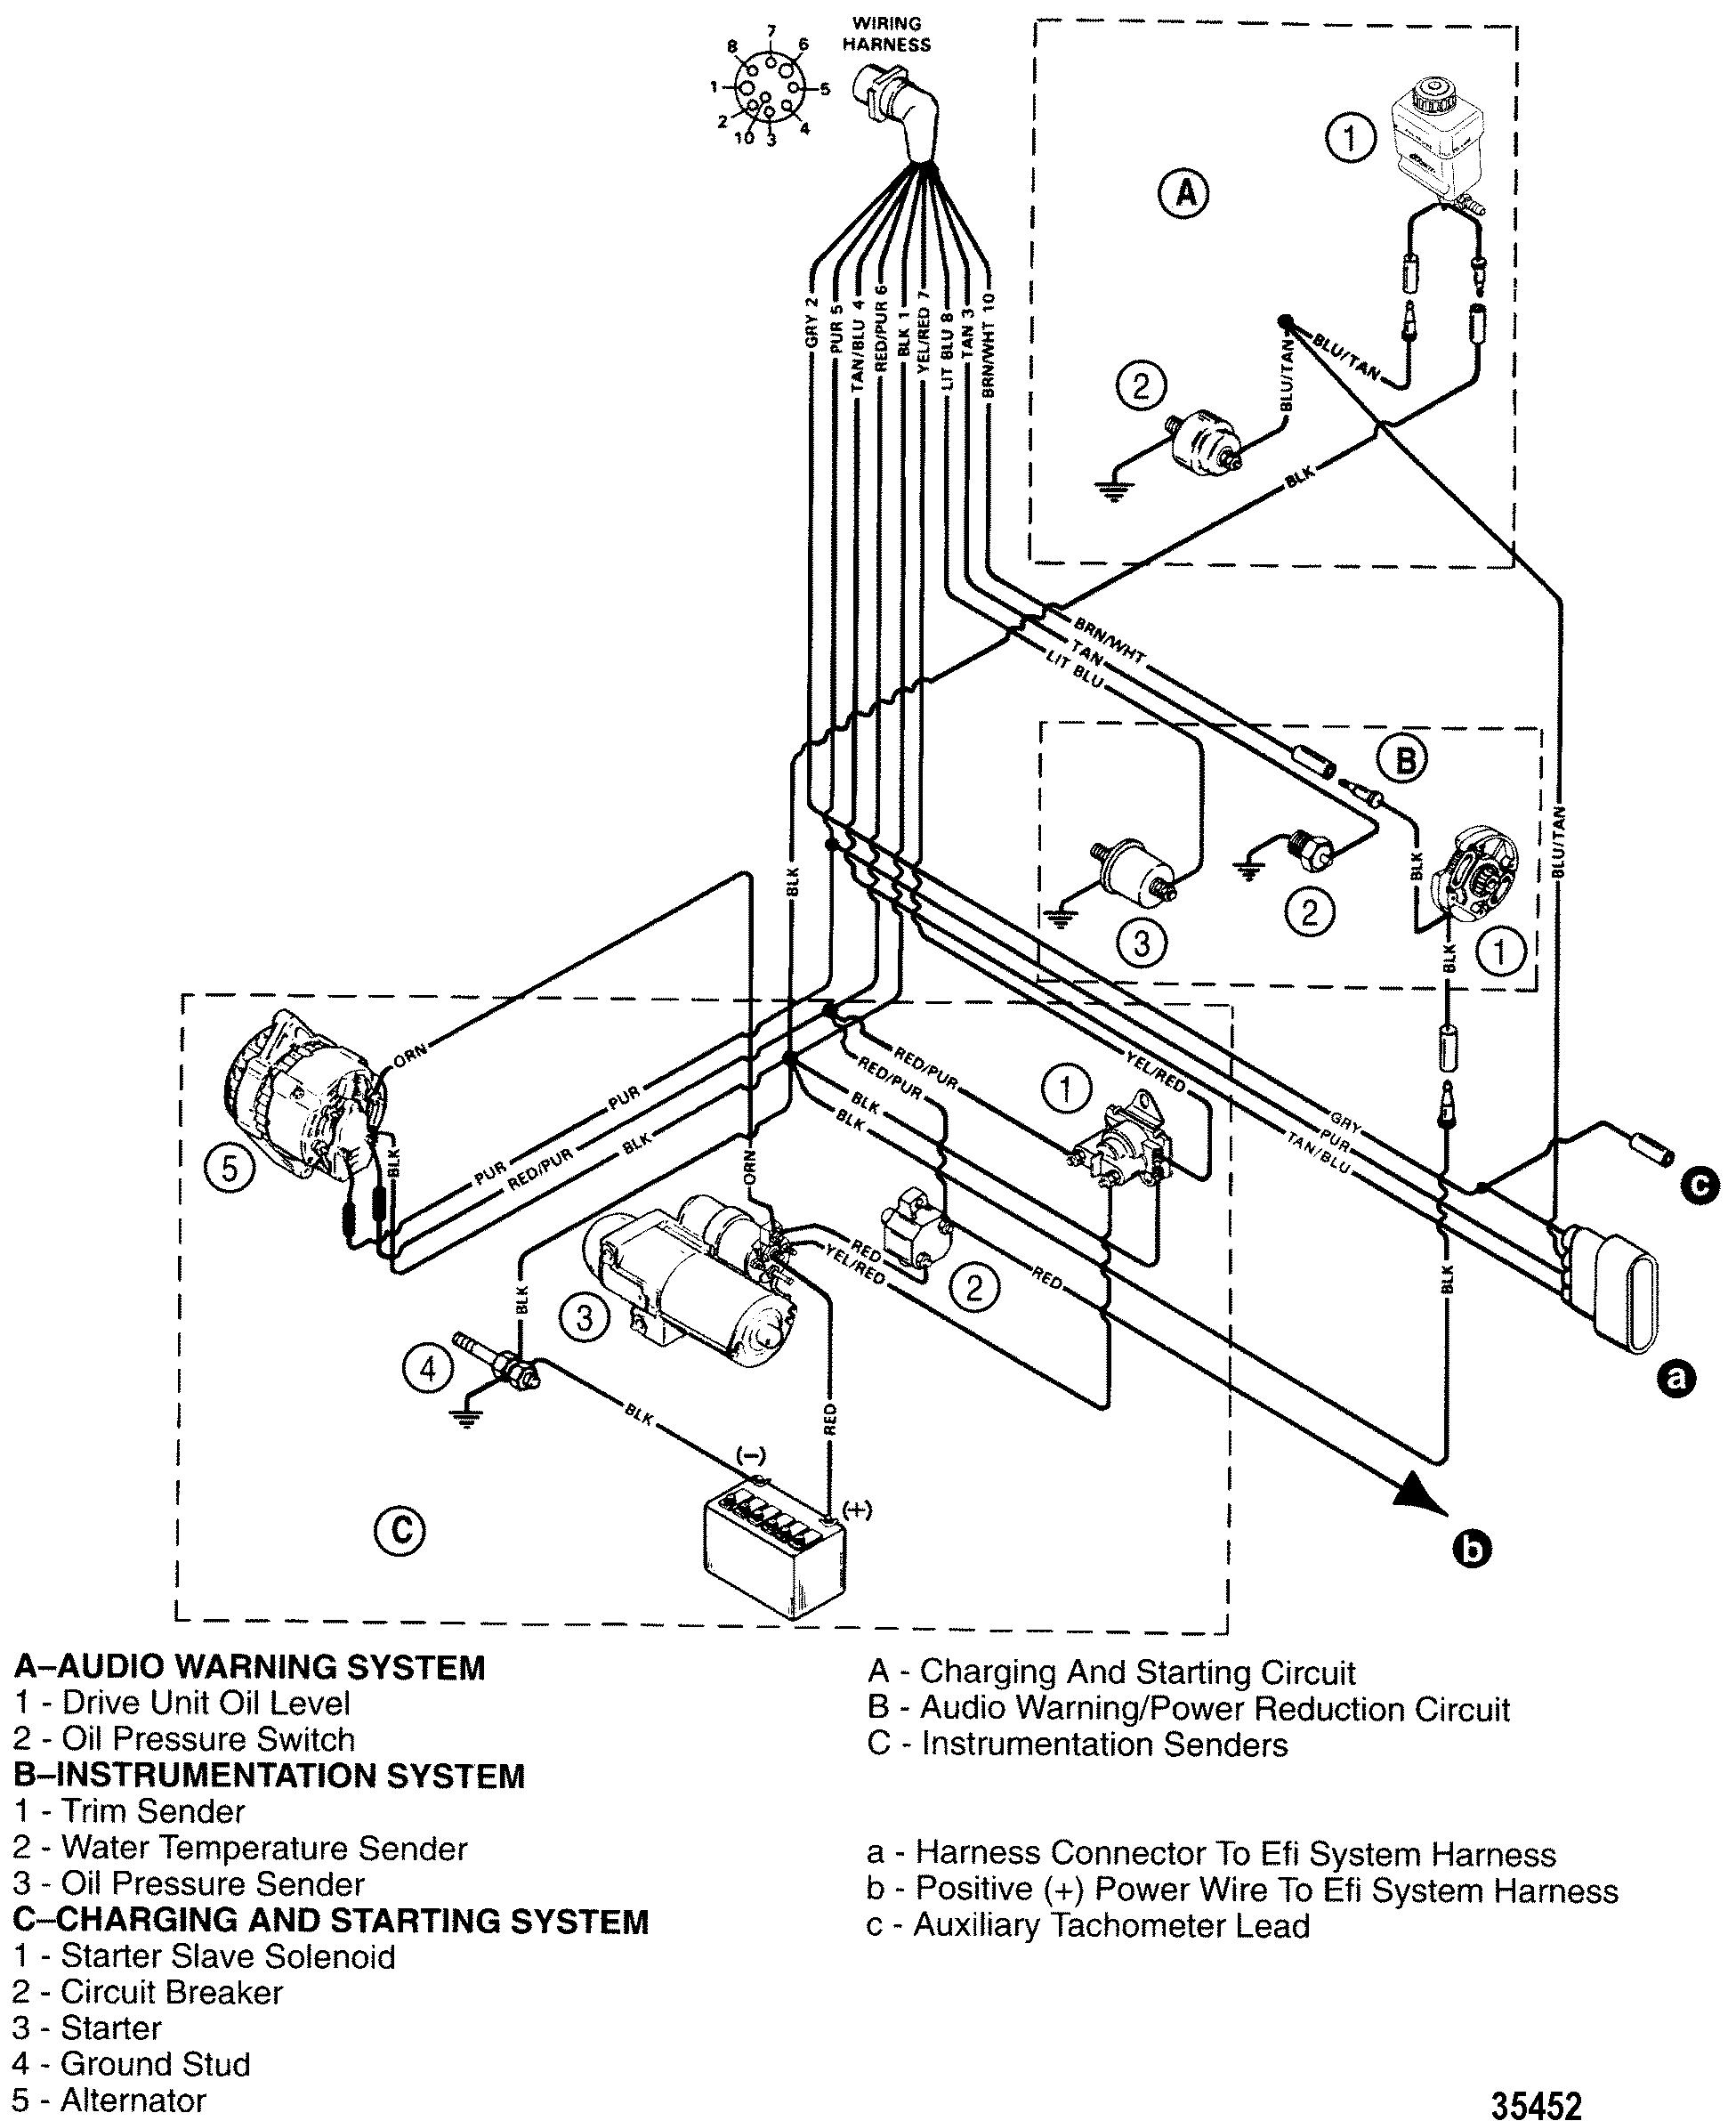 Viper 350 Plus Wiring Diagram P90 335 Wiring Harness – Indmar Starter Wiring Diagram